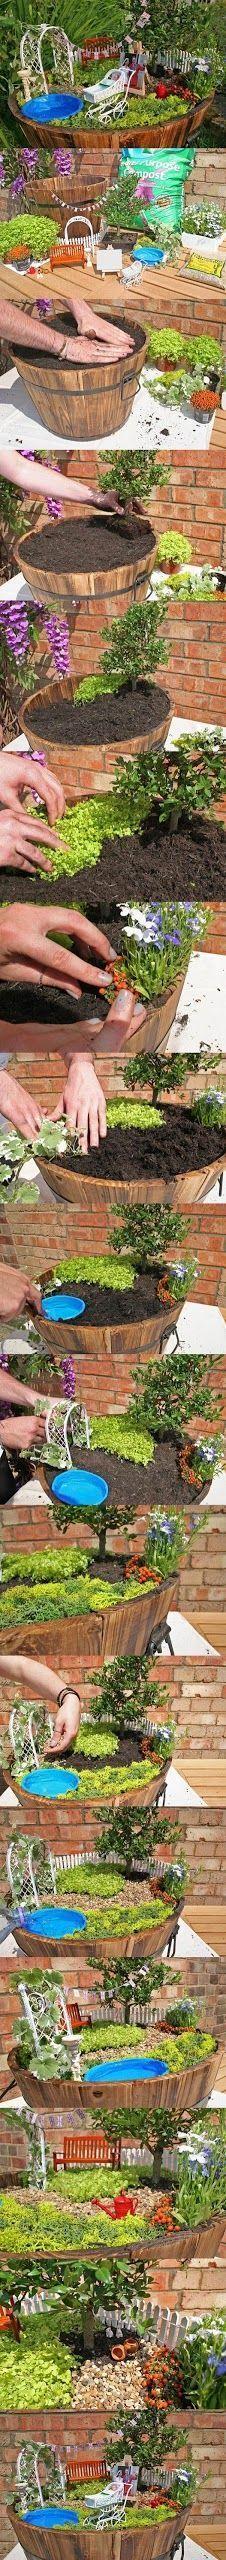 Feengarten mit Entstehung #miniaturegardens